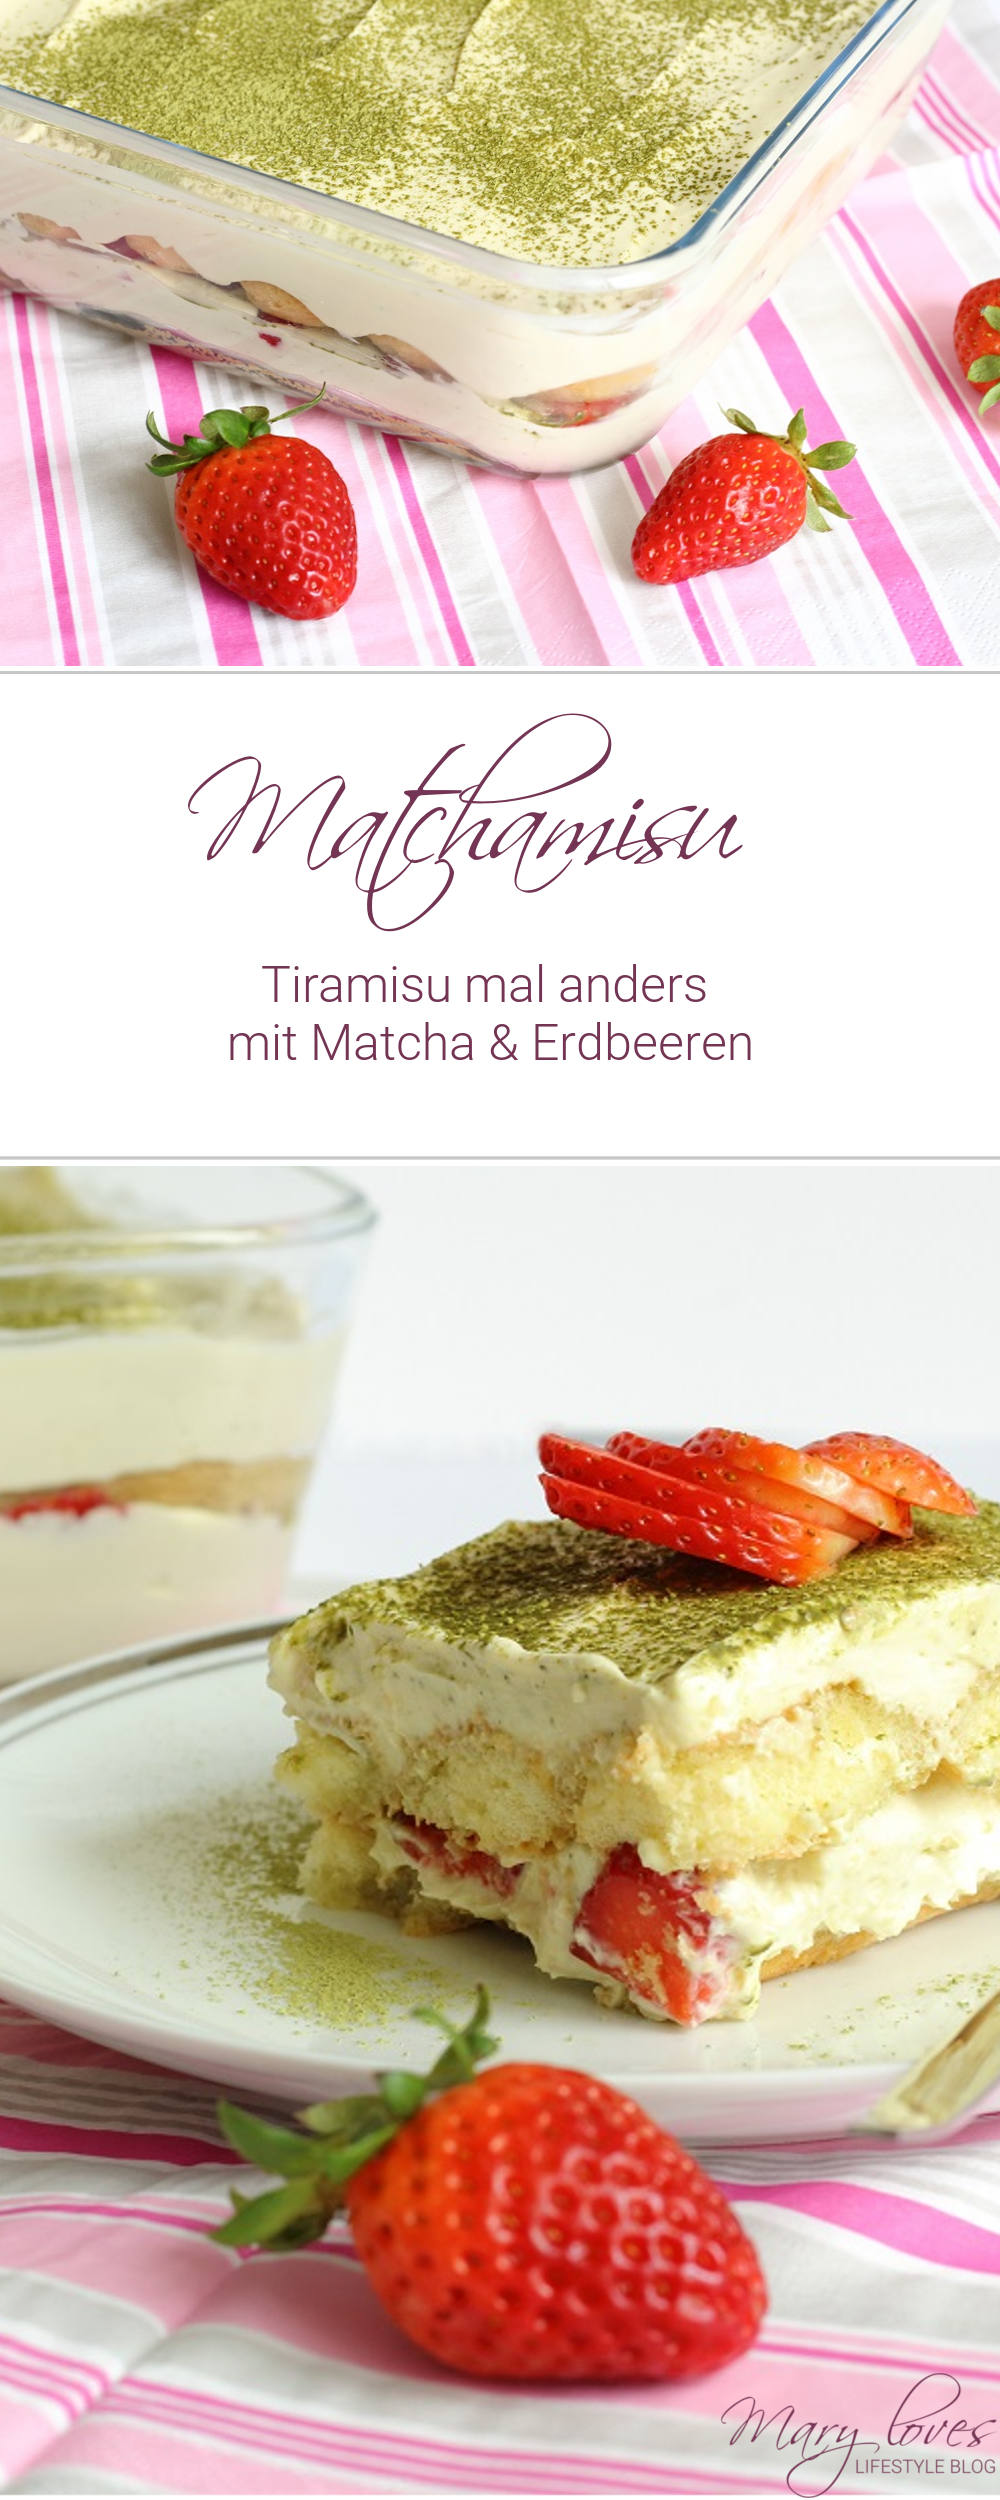 Matchamisu - Tiramisu mit Matcha und Erdbeeren - Rezept